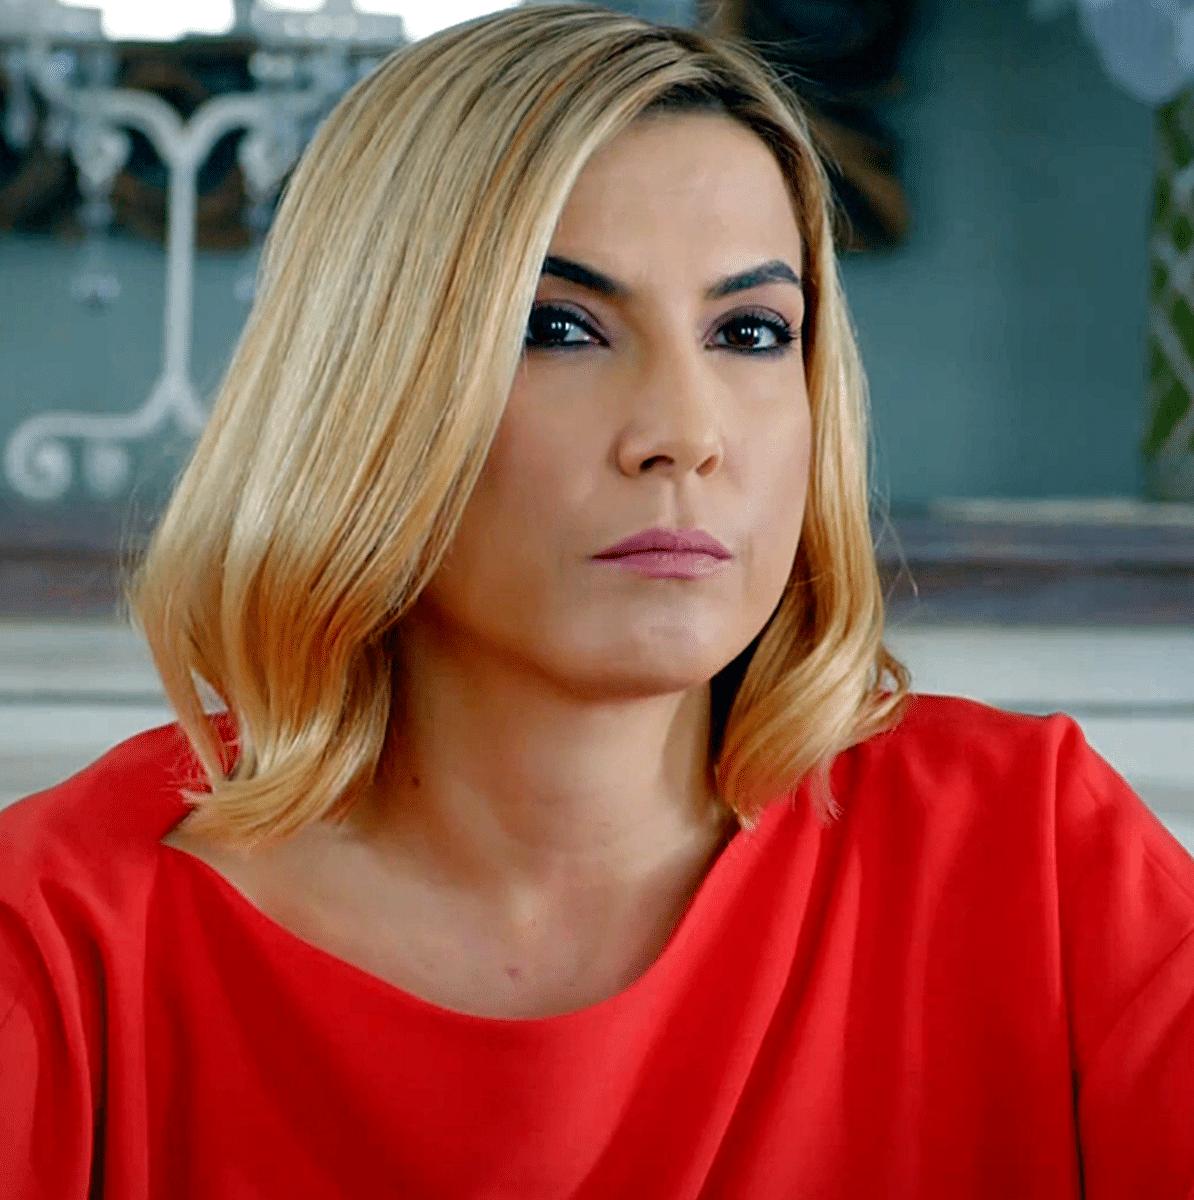 Şebnem Dönmez Turkish, German Actress, TV Host